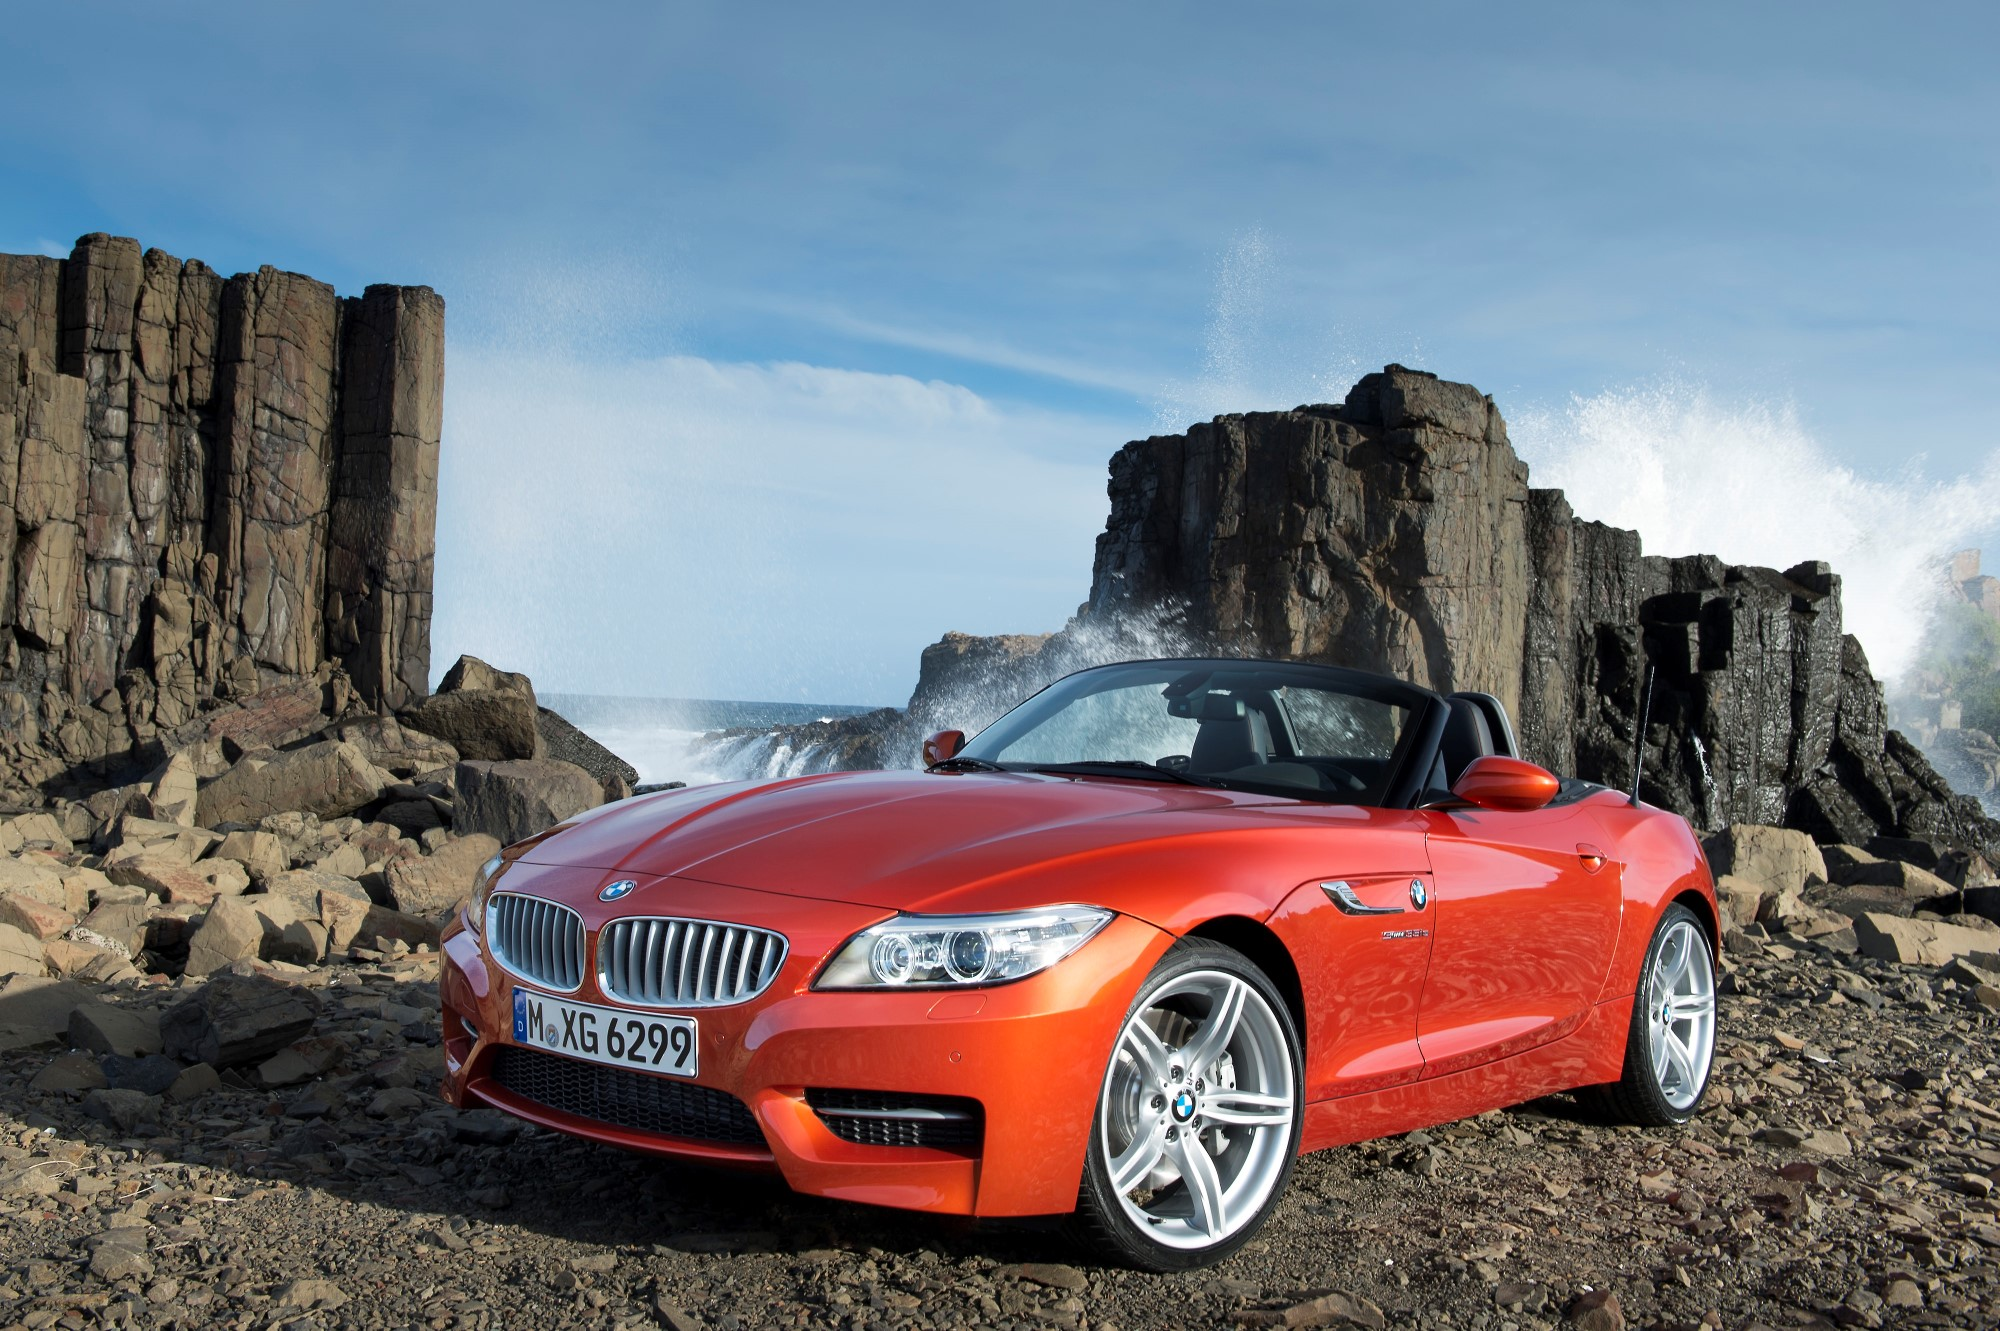 2012-2014 BMW 3-Series, 4-Series, X1, X3, Z4 Recalled To